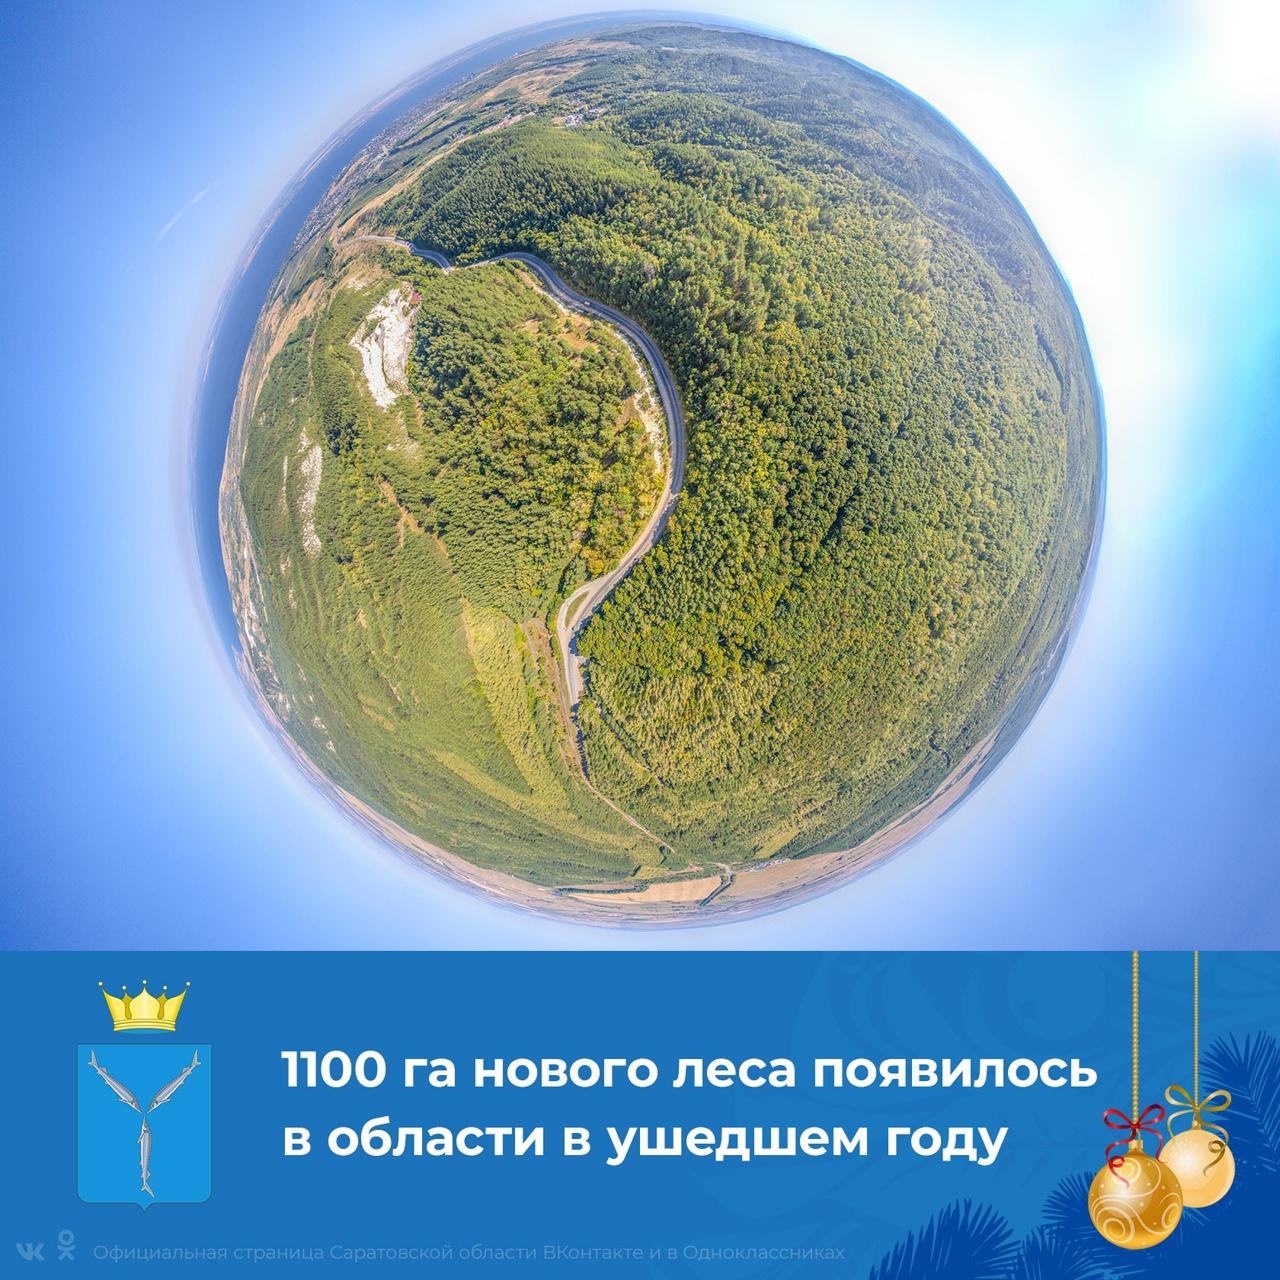 По национальному проекту Президента РФ «Экология» в 2020 году в Саратовской области лес восстановлен на площади 1 100 га